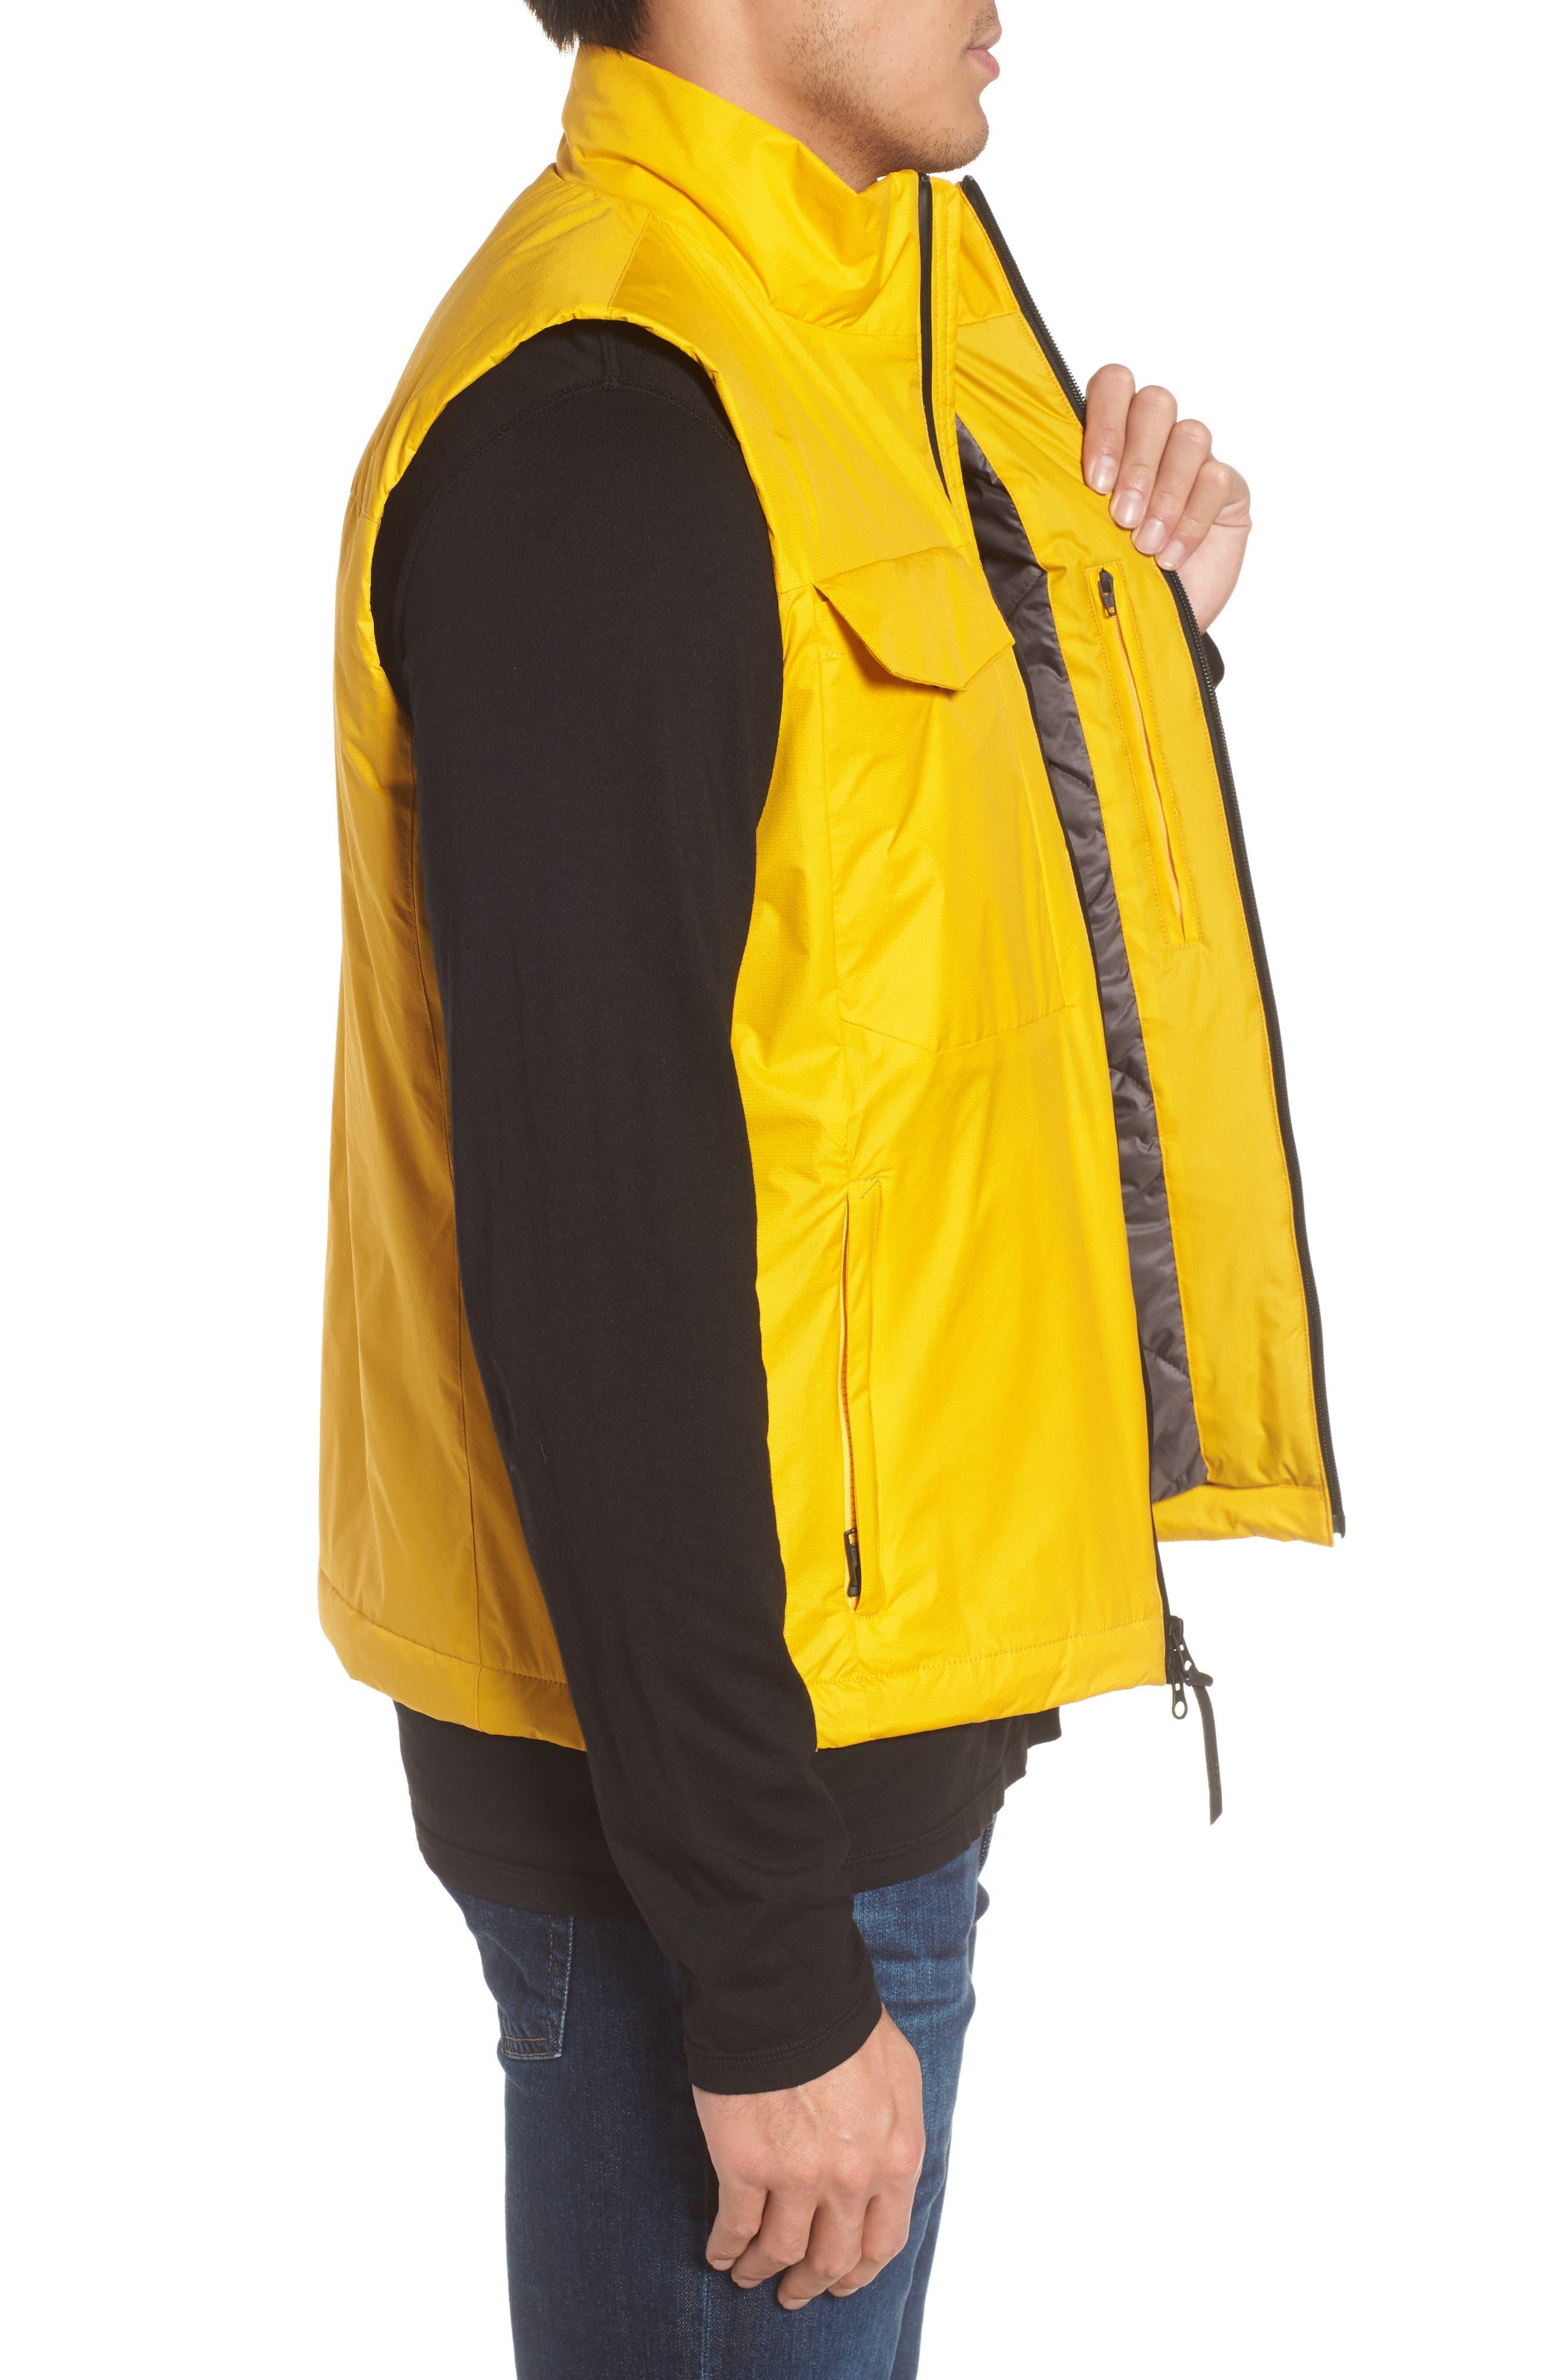 & Bros. Bering Vest,                             Alternate thumbnail 3, color,                             Golden Spice